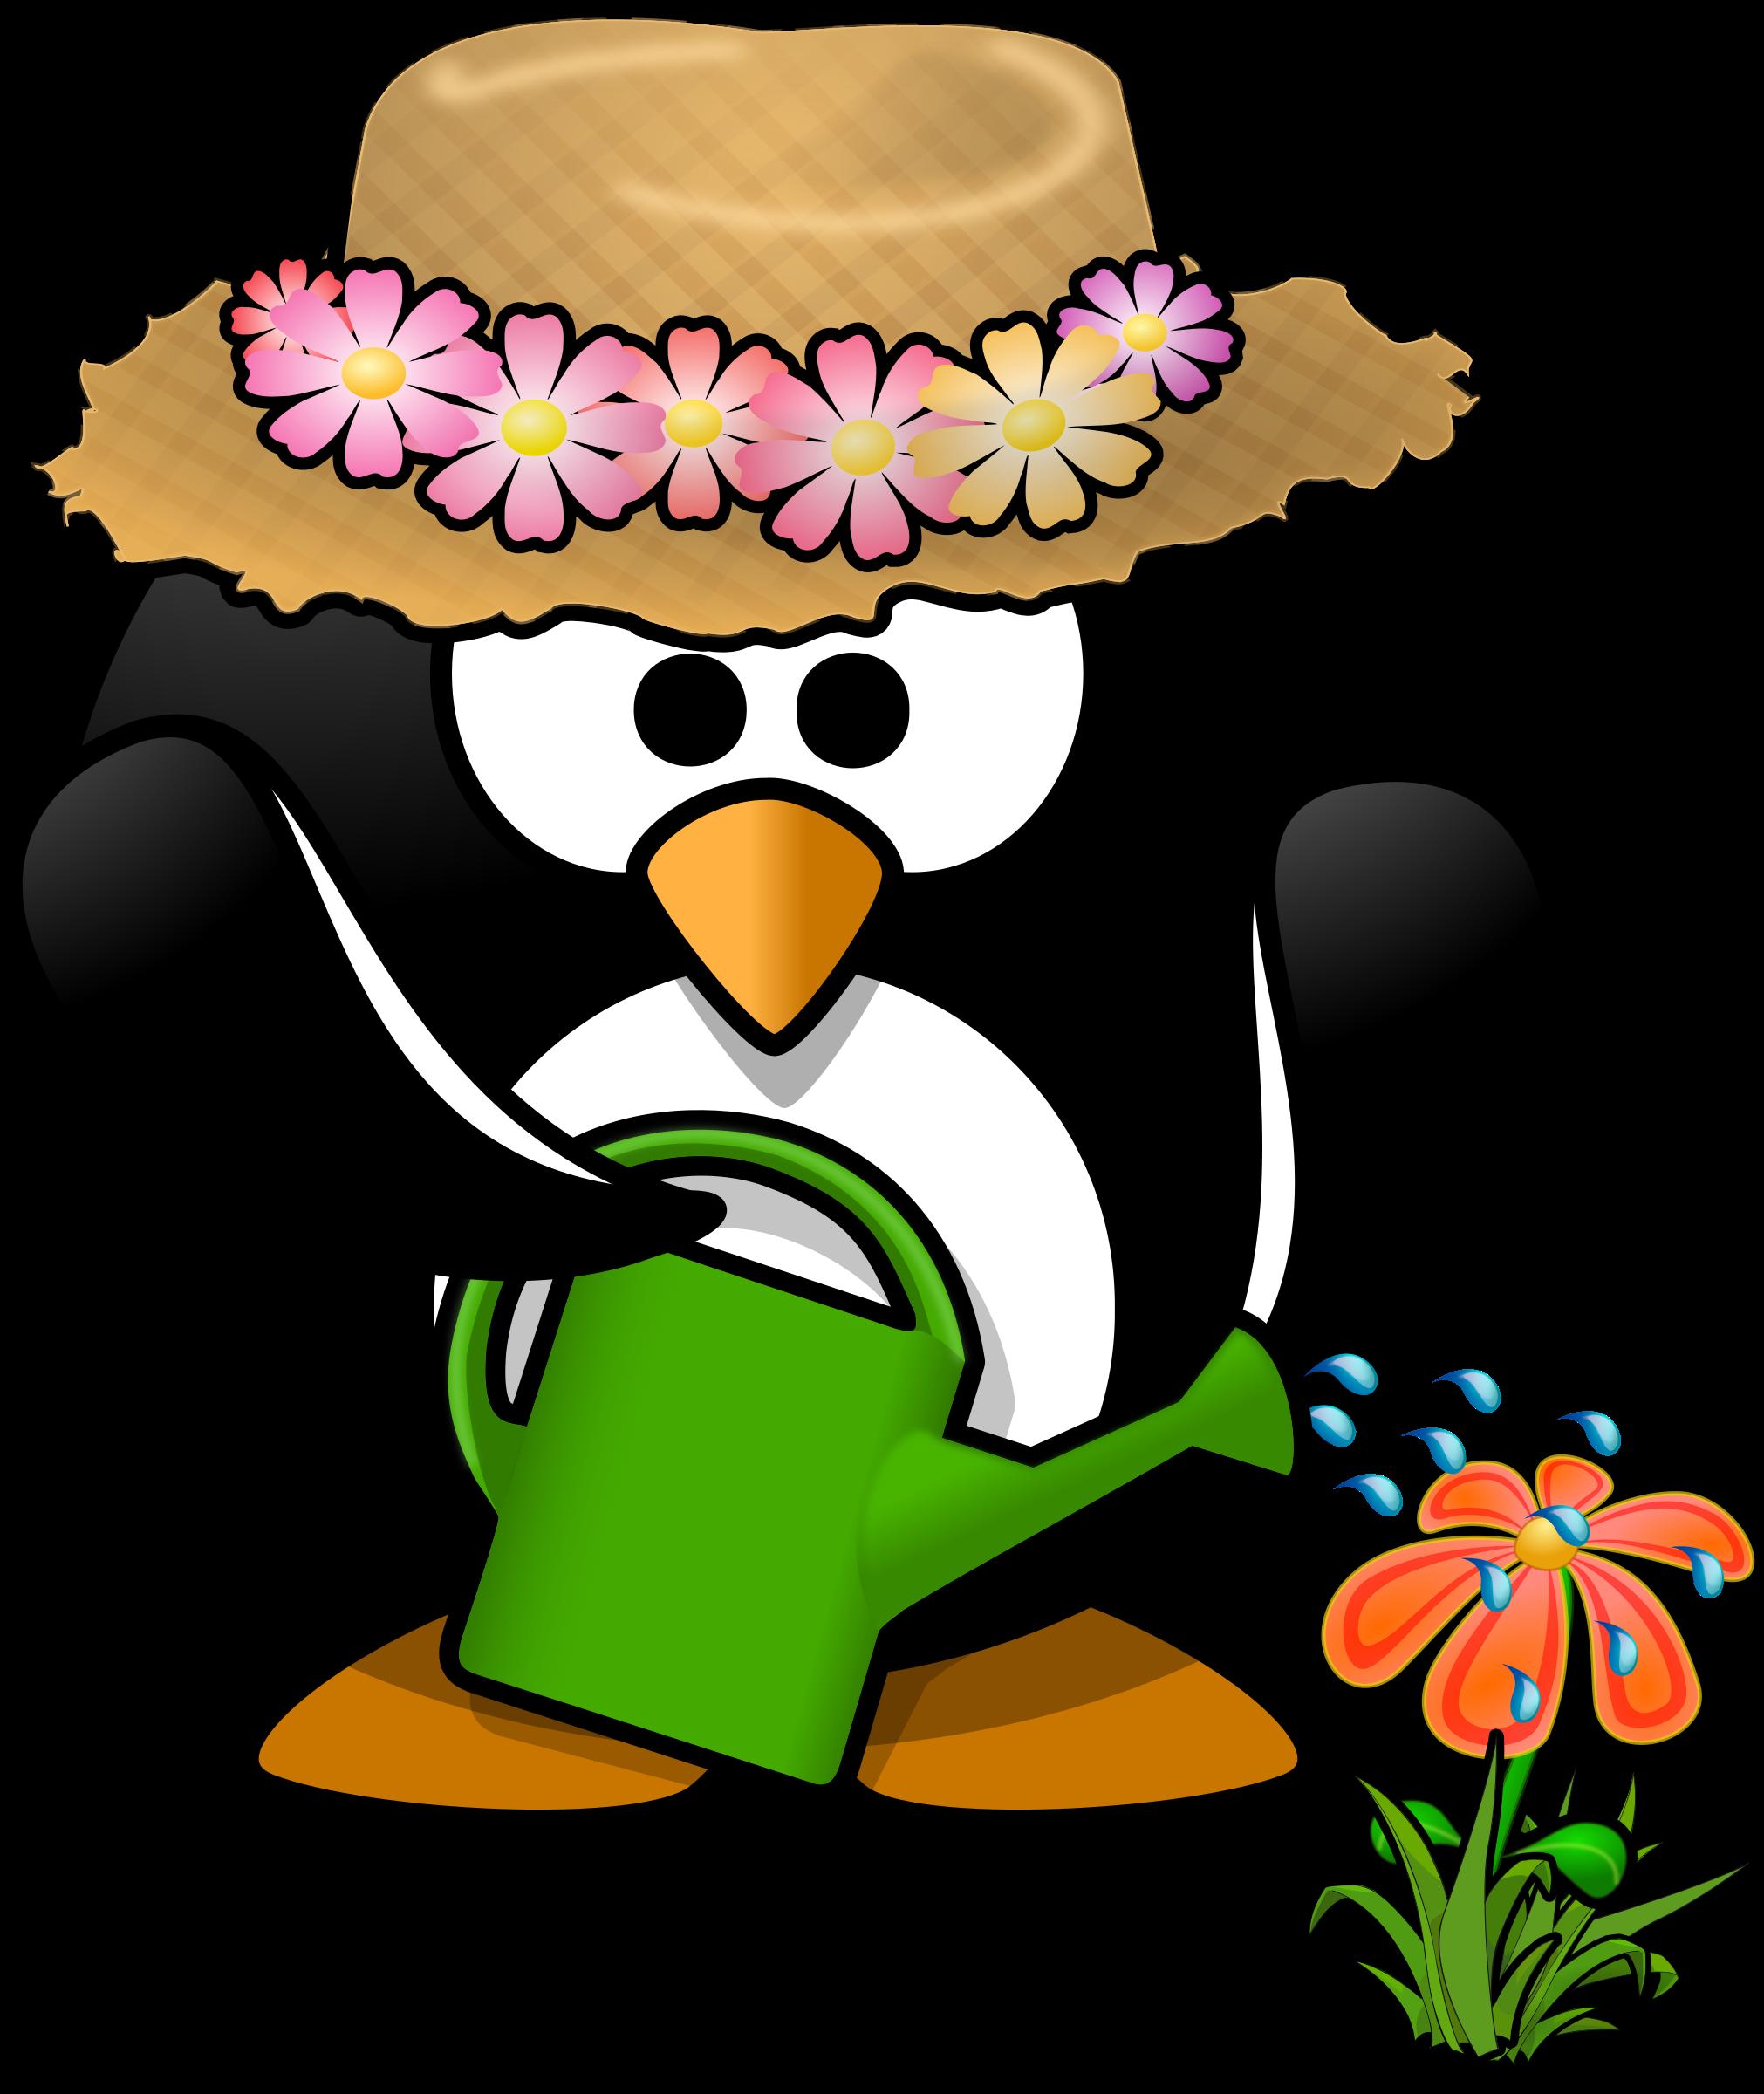 Word garden clipart jpg Free Garden Clipart Pictures - Clipartix jpg